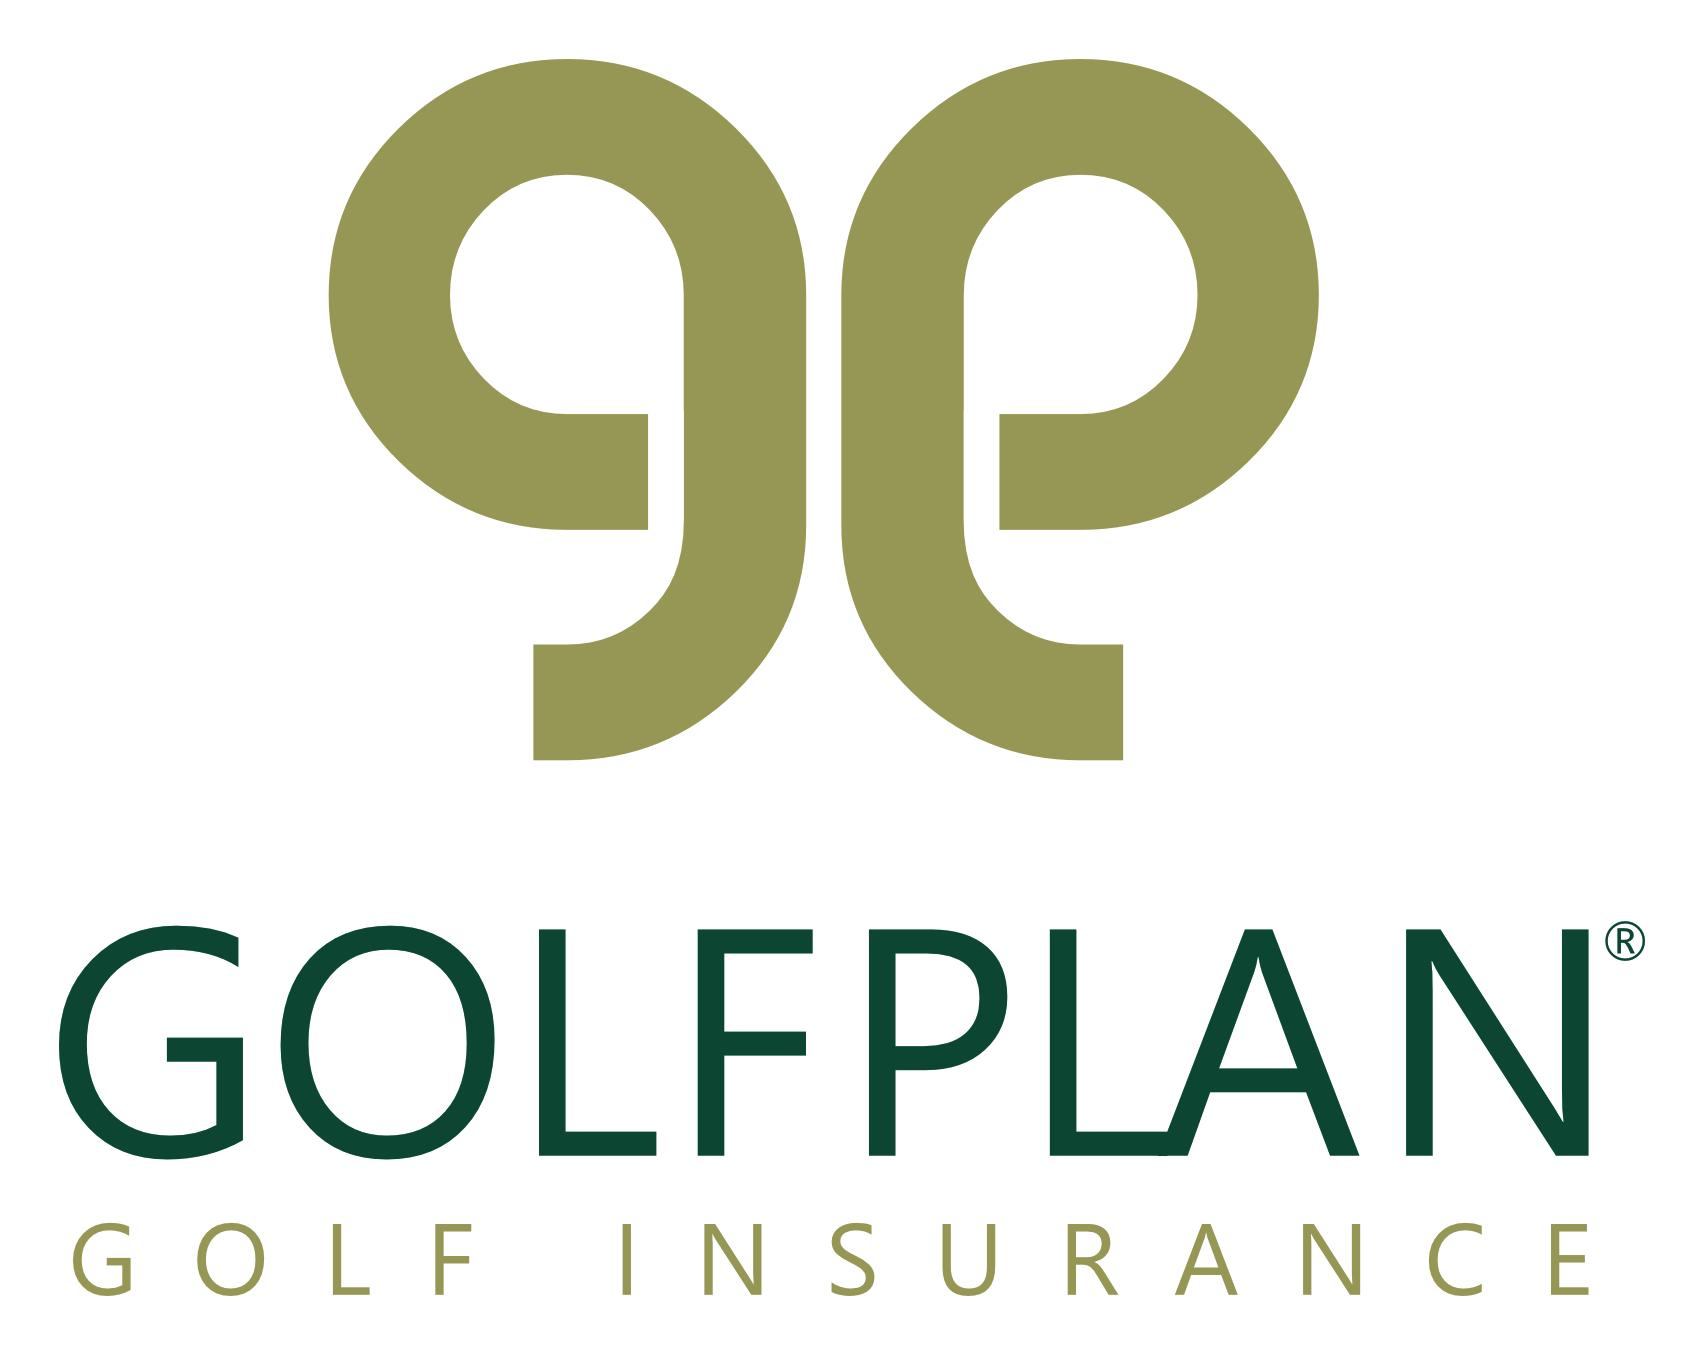 GolfPlan